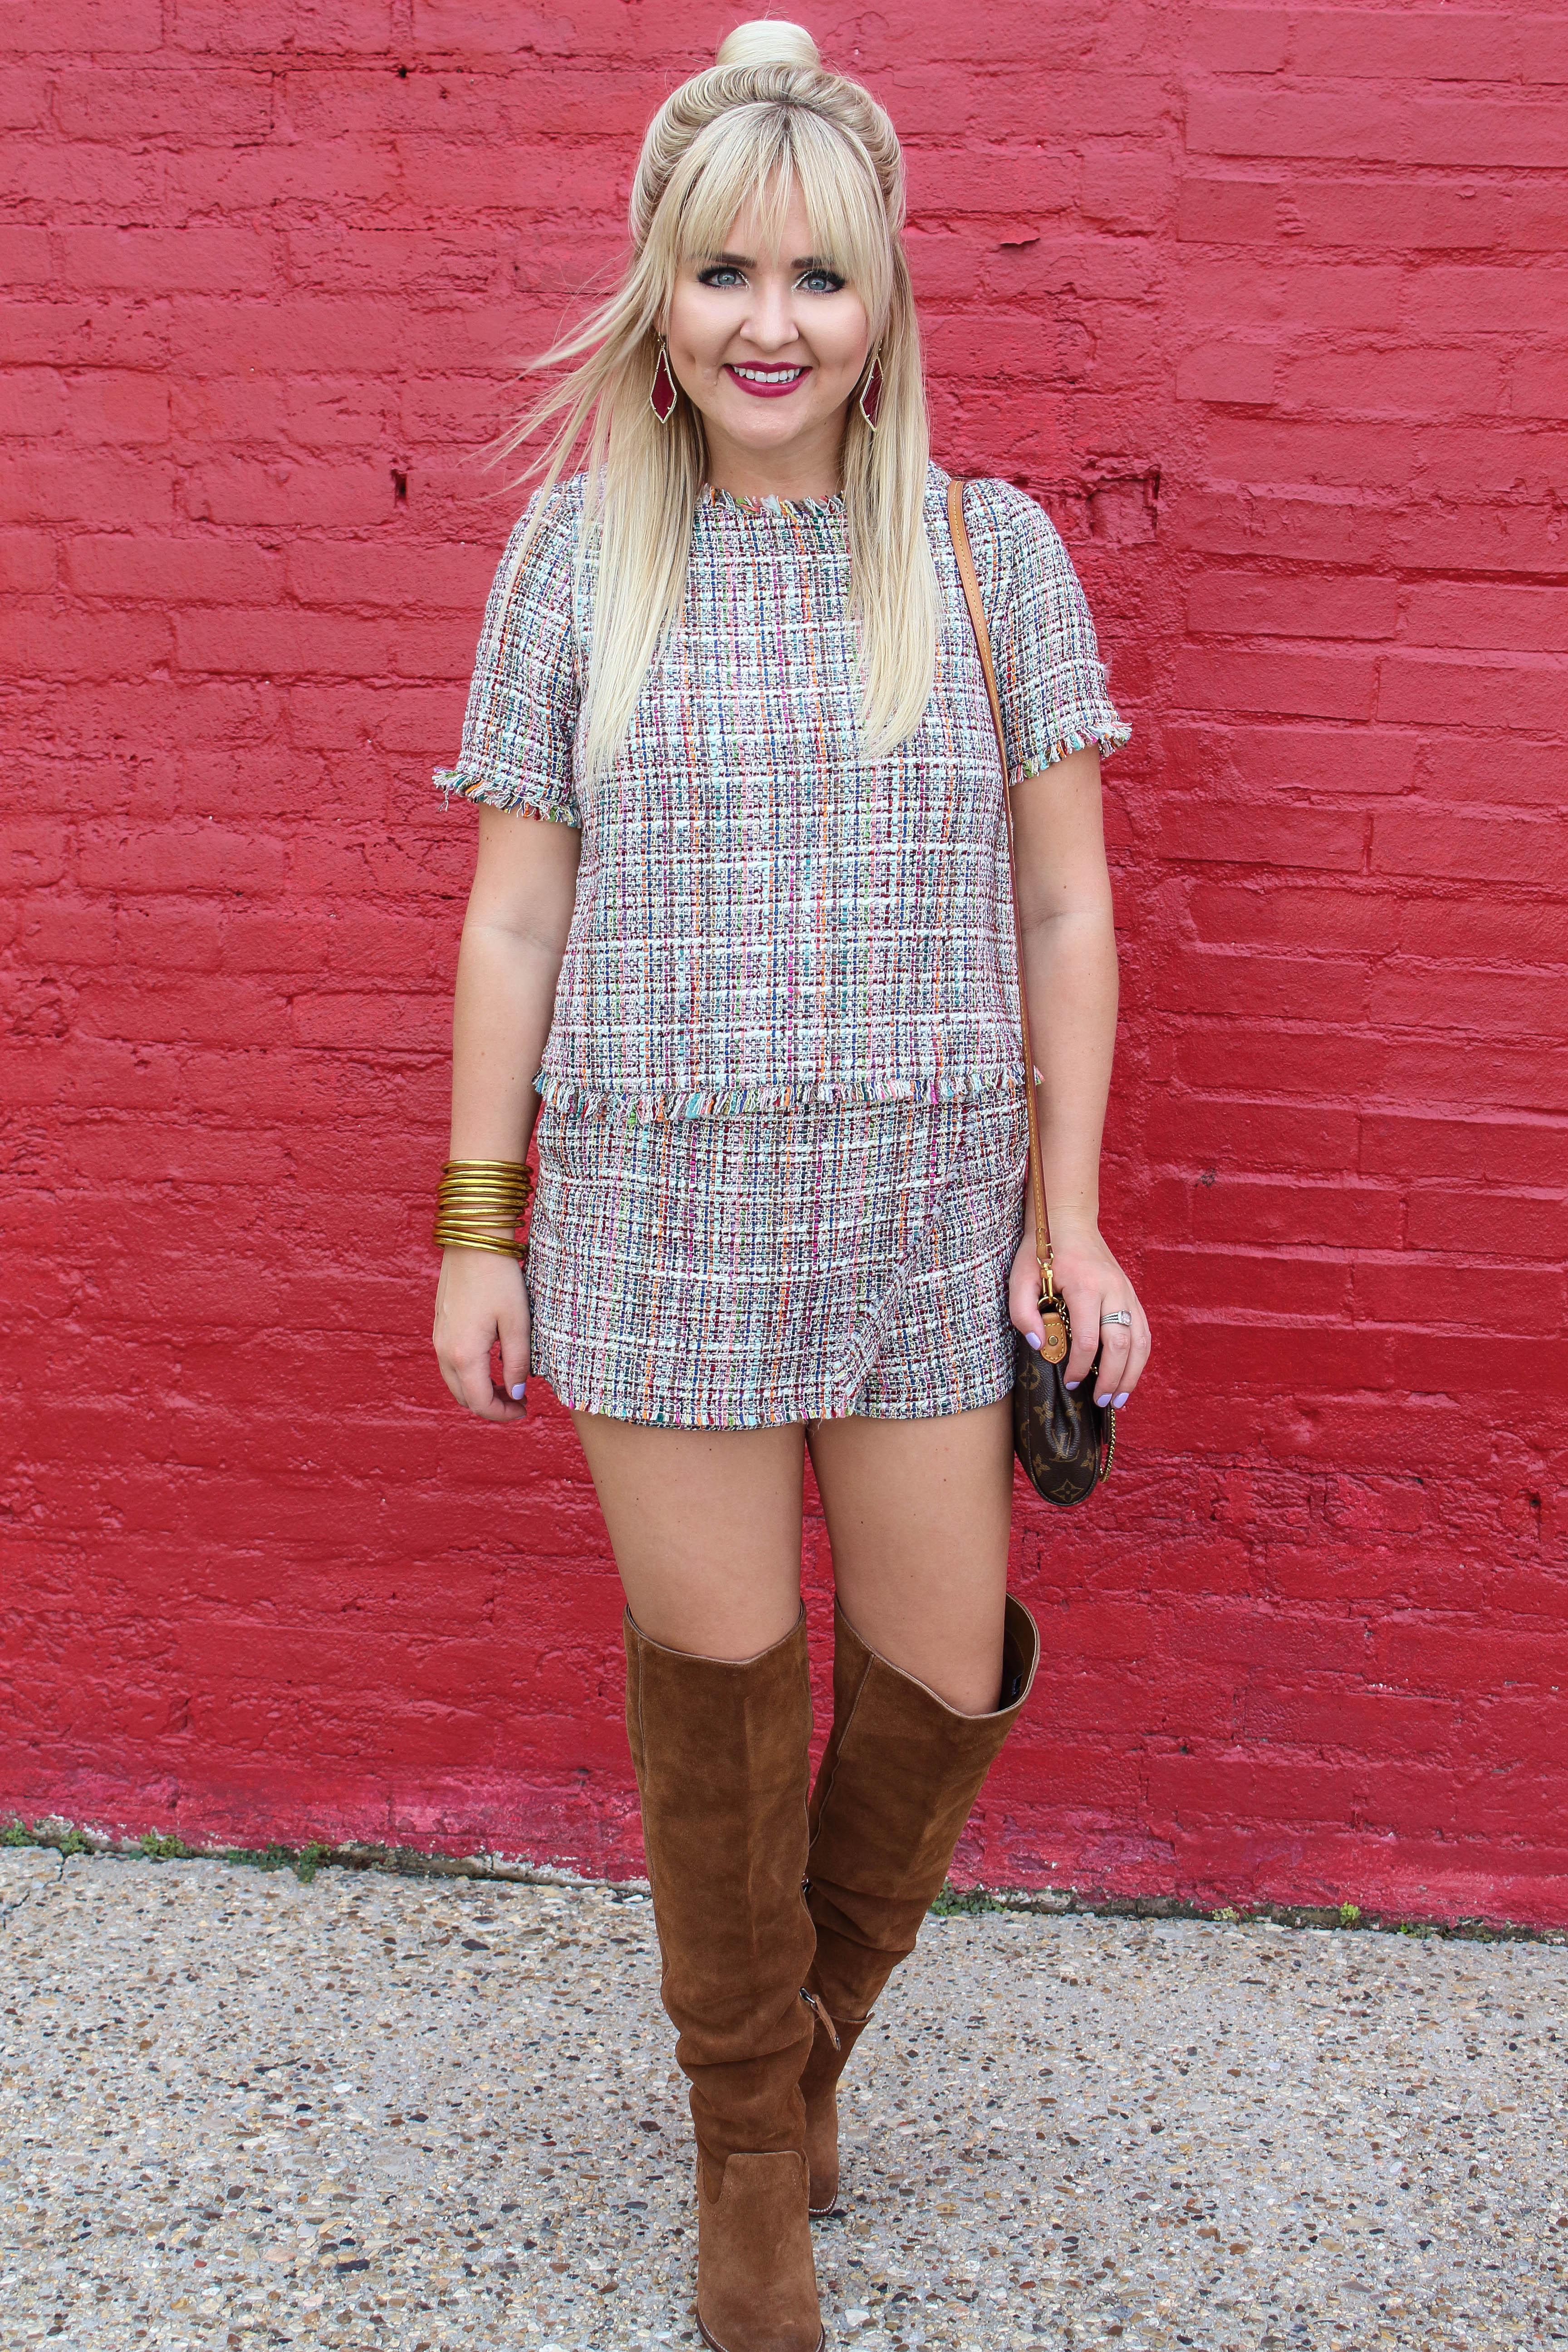 43a8d2fda0 Zara Tweed Set - Sassy Southern Blonde